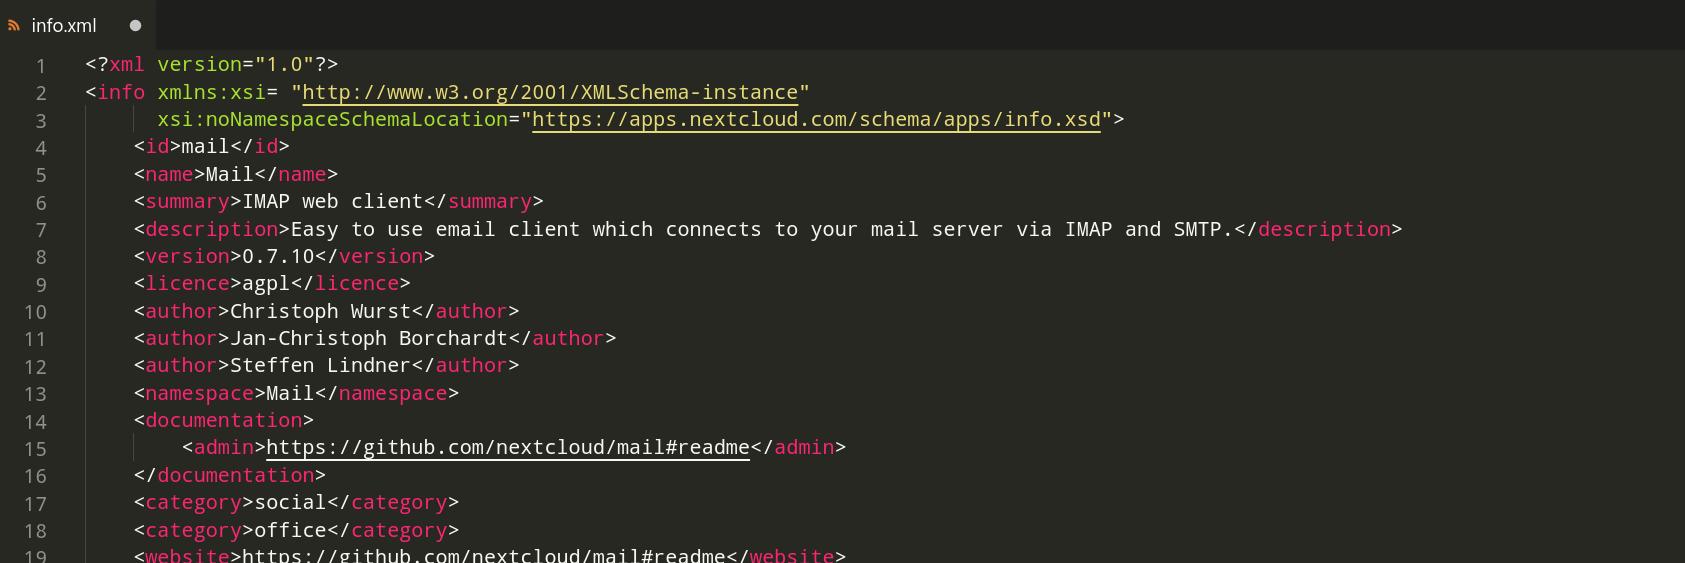 Validate Nextcloud's info.xml on CI